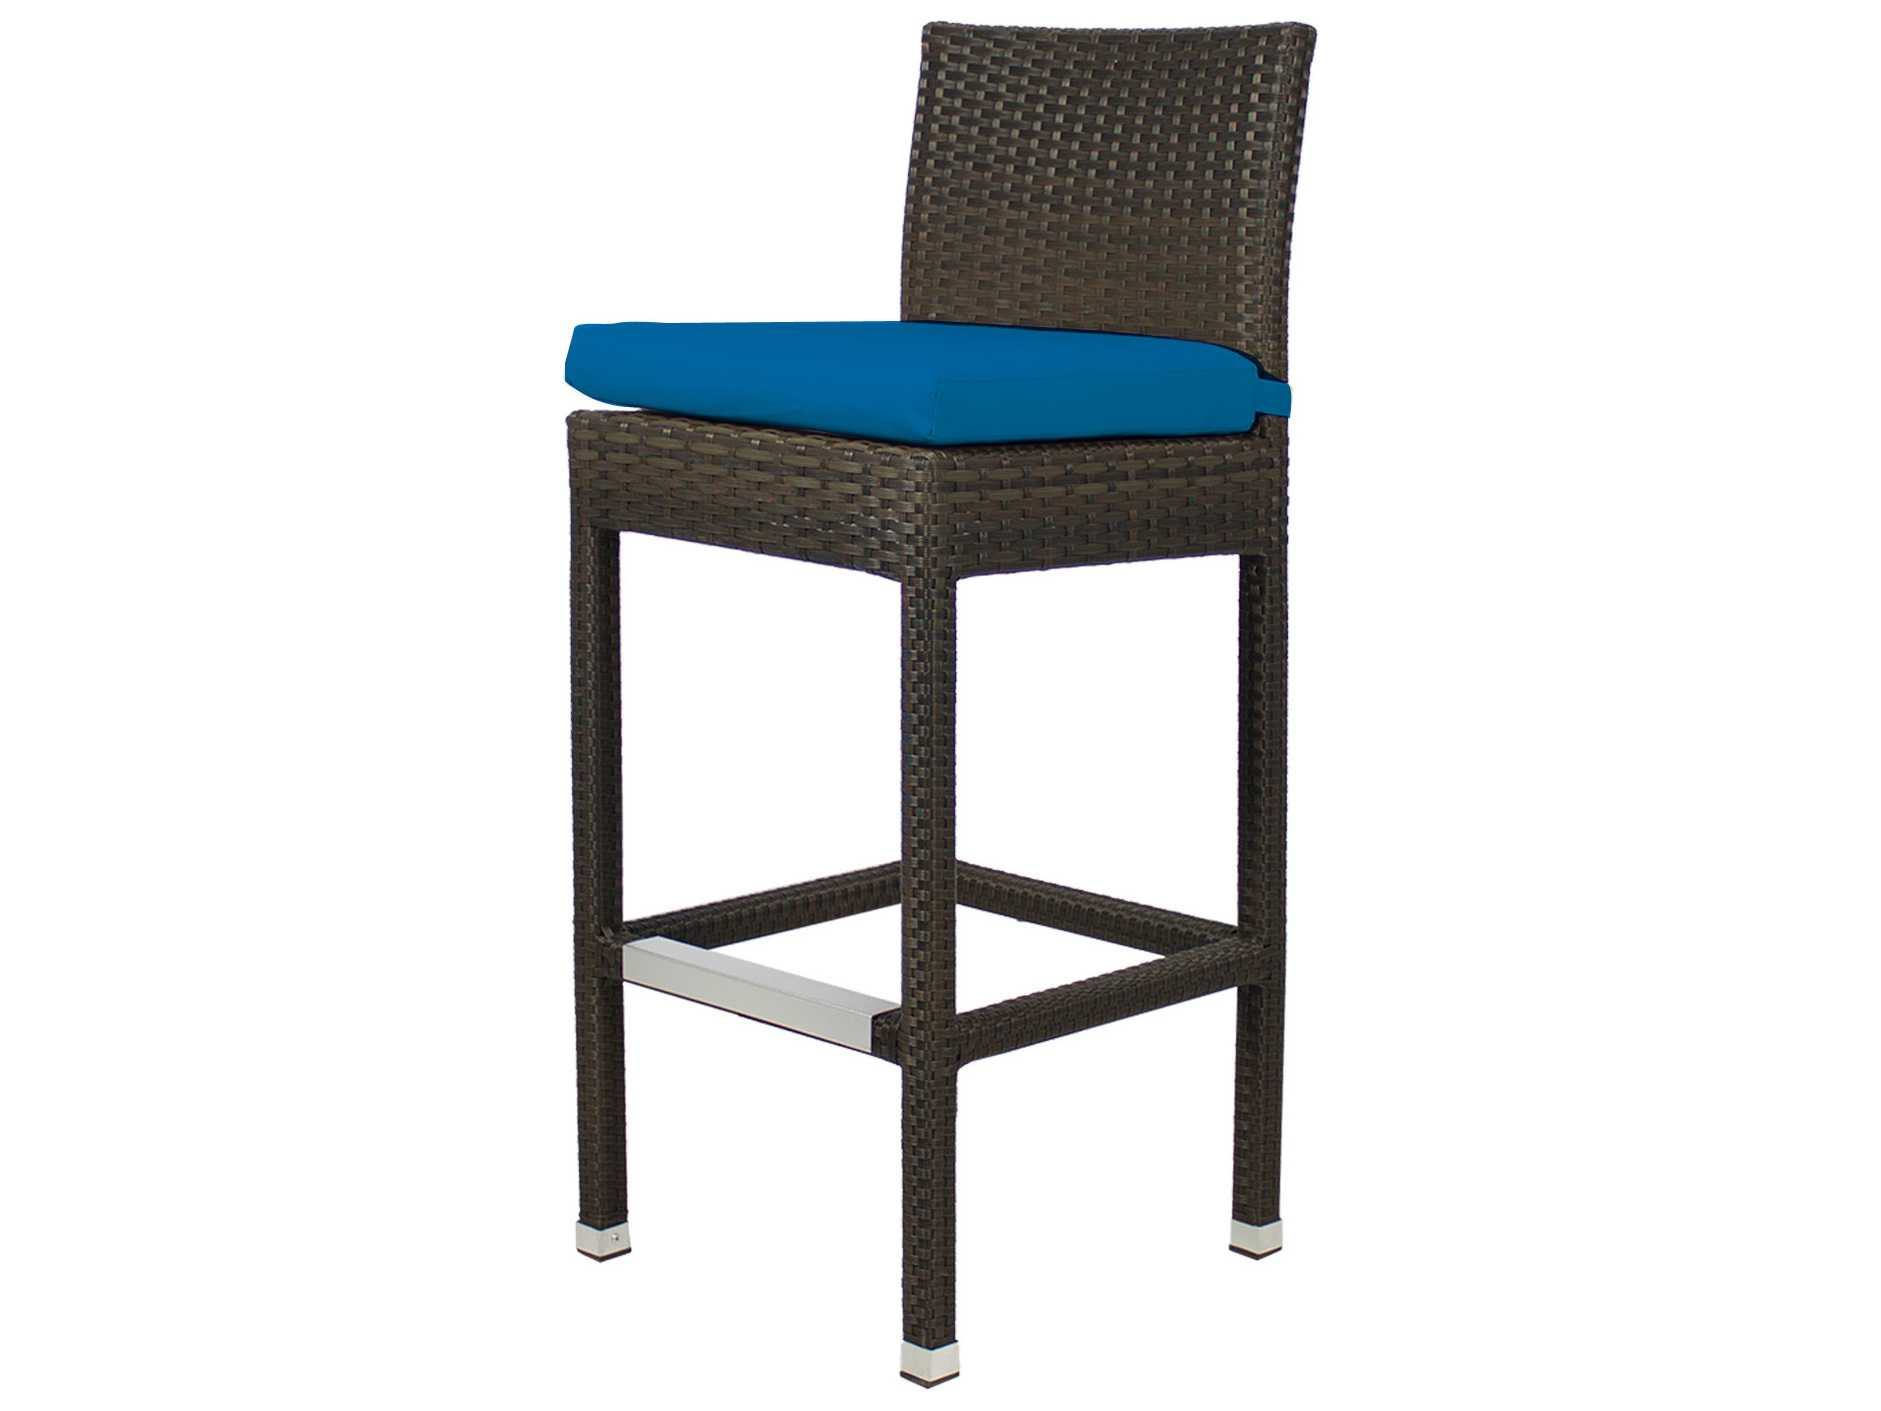 Source Outdoor Furniture Zen Wicker Bar Stool Set ZENBARSET3 : SCSO2002172zm from www.patioliving.com size 1881 x 1411 jpeg 70kB